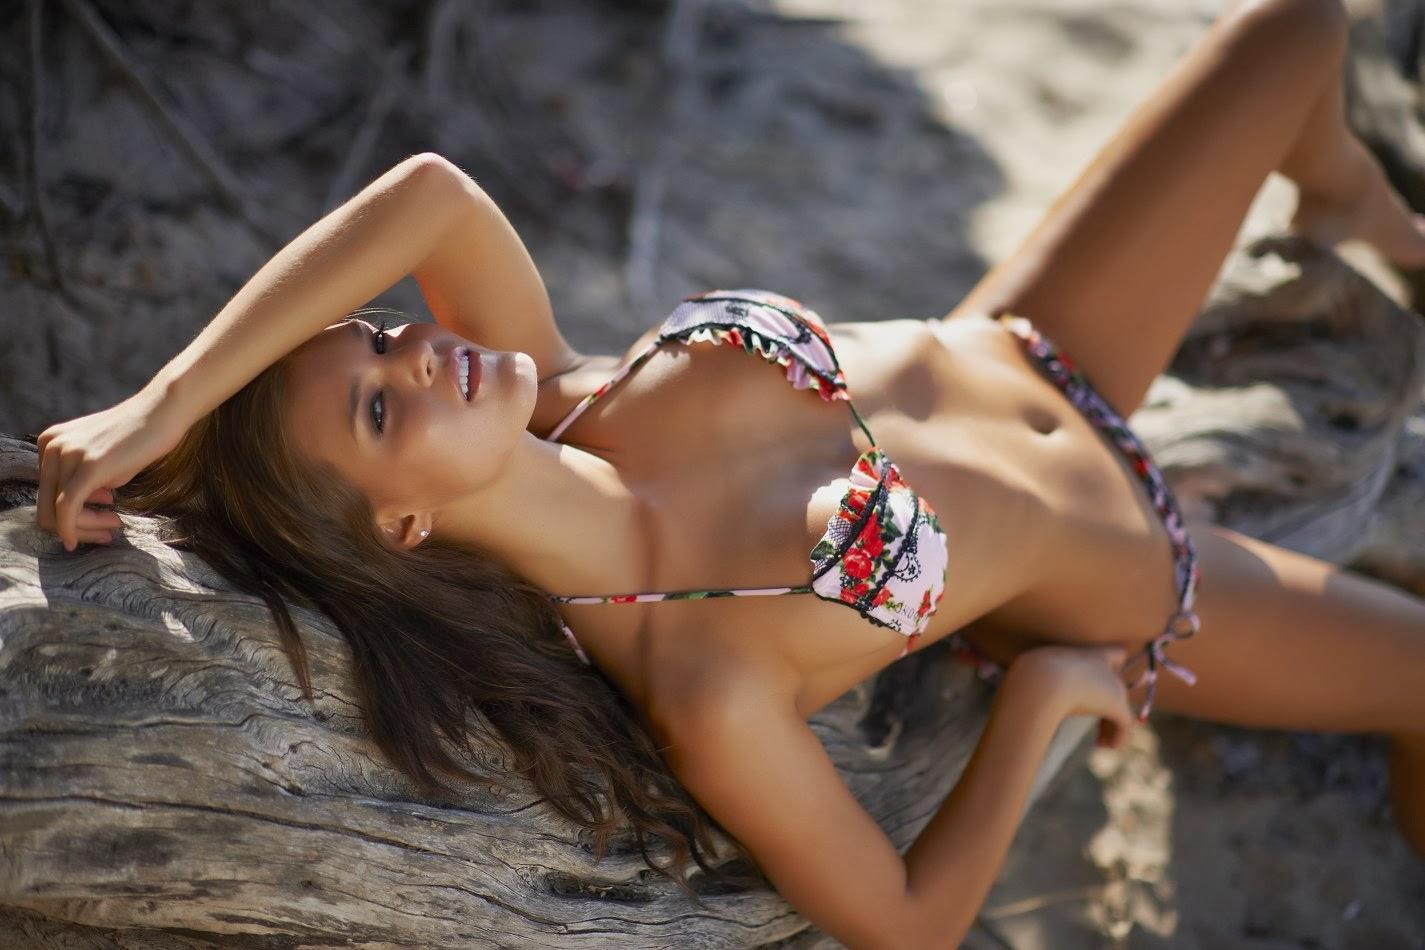 Joy Corrigan en bikini